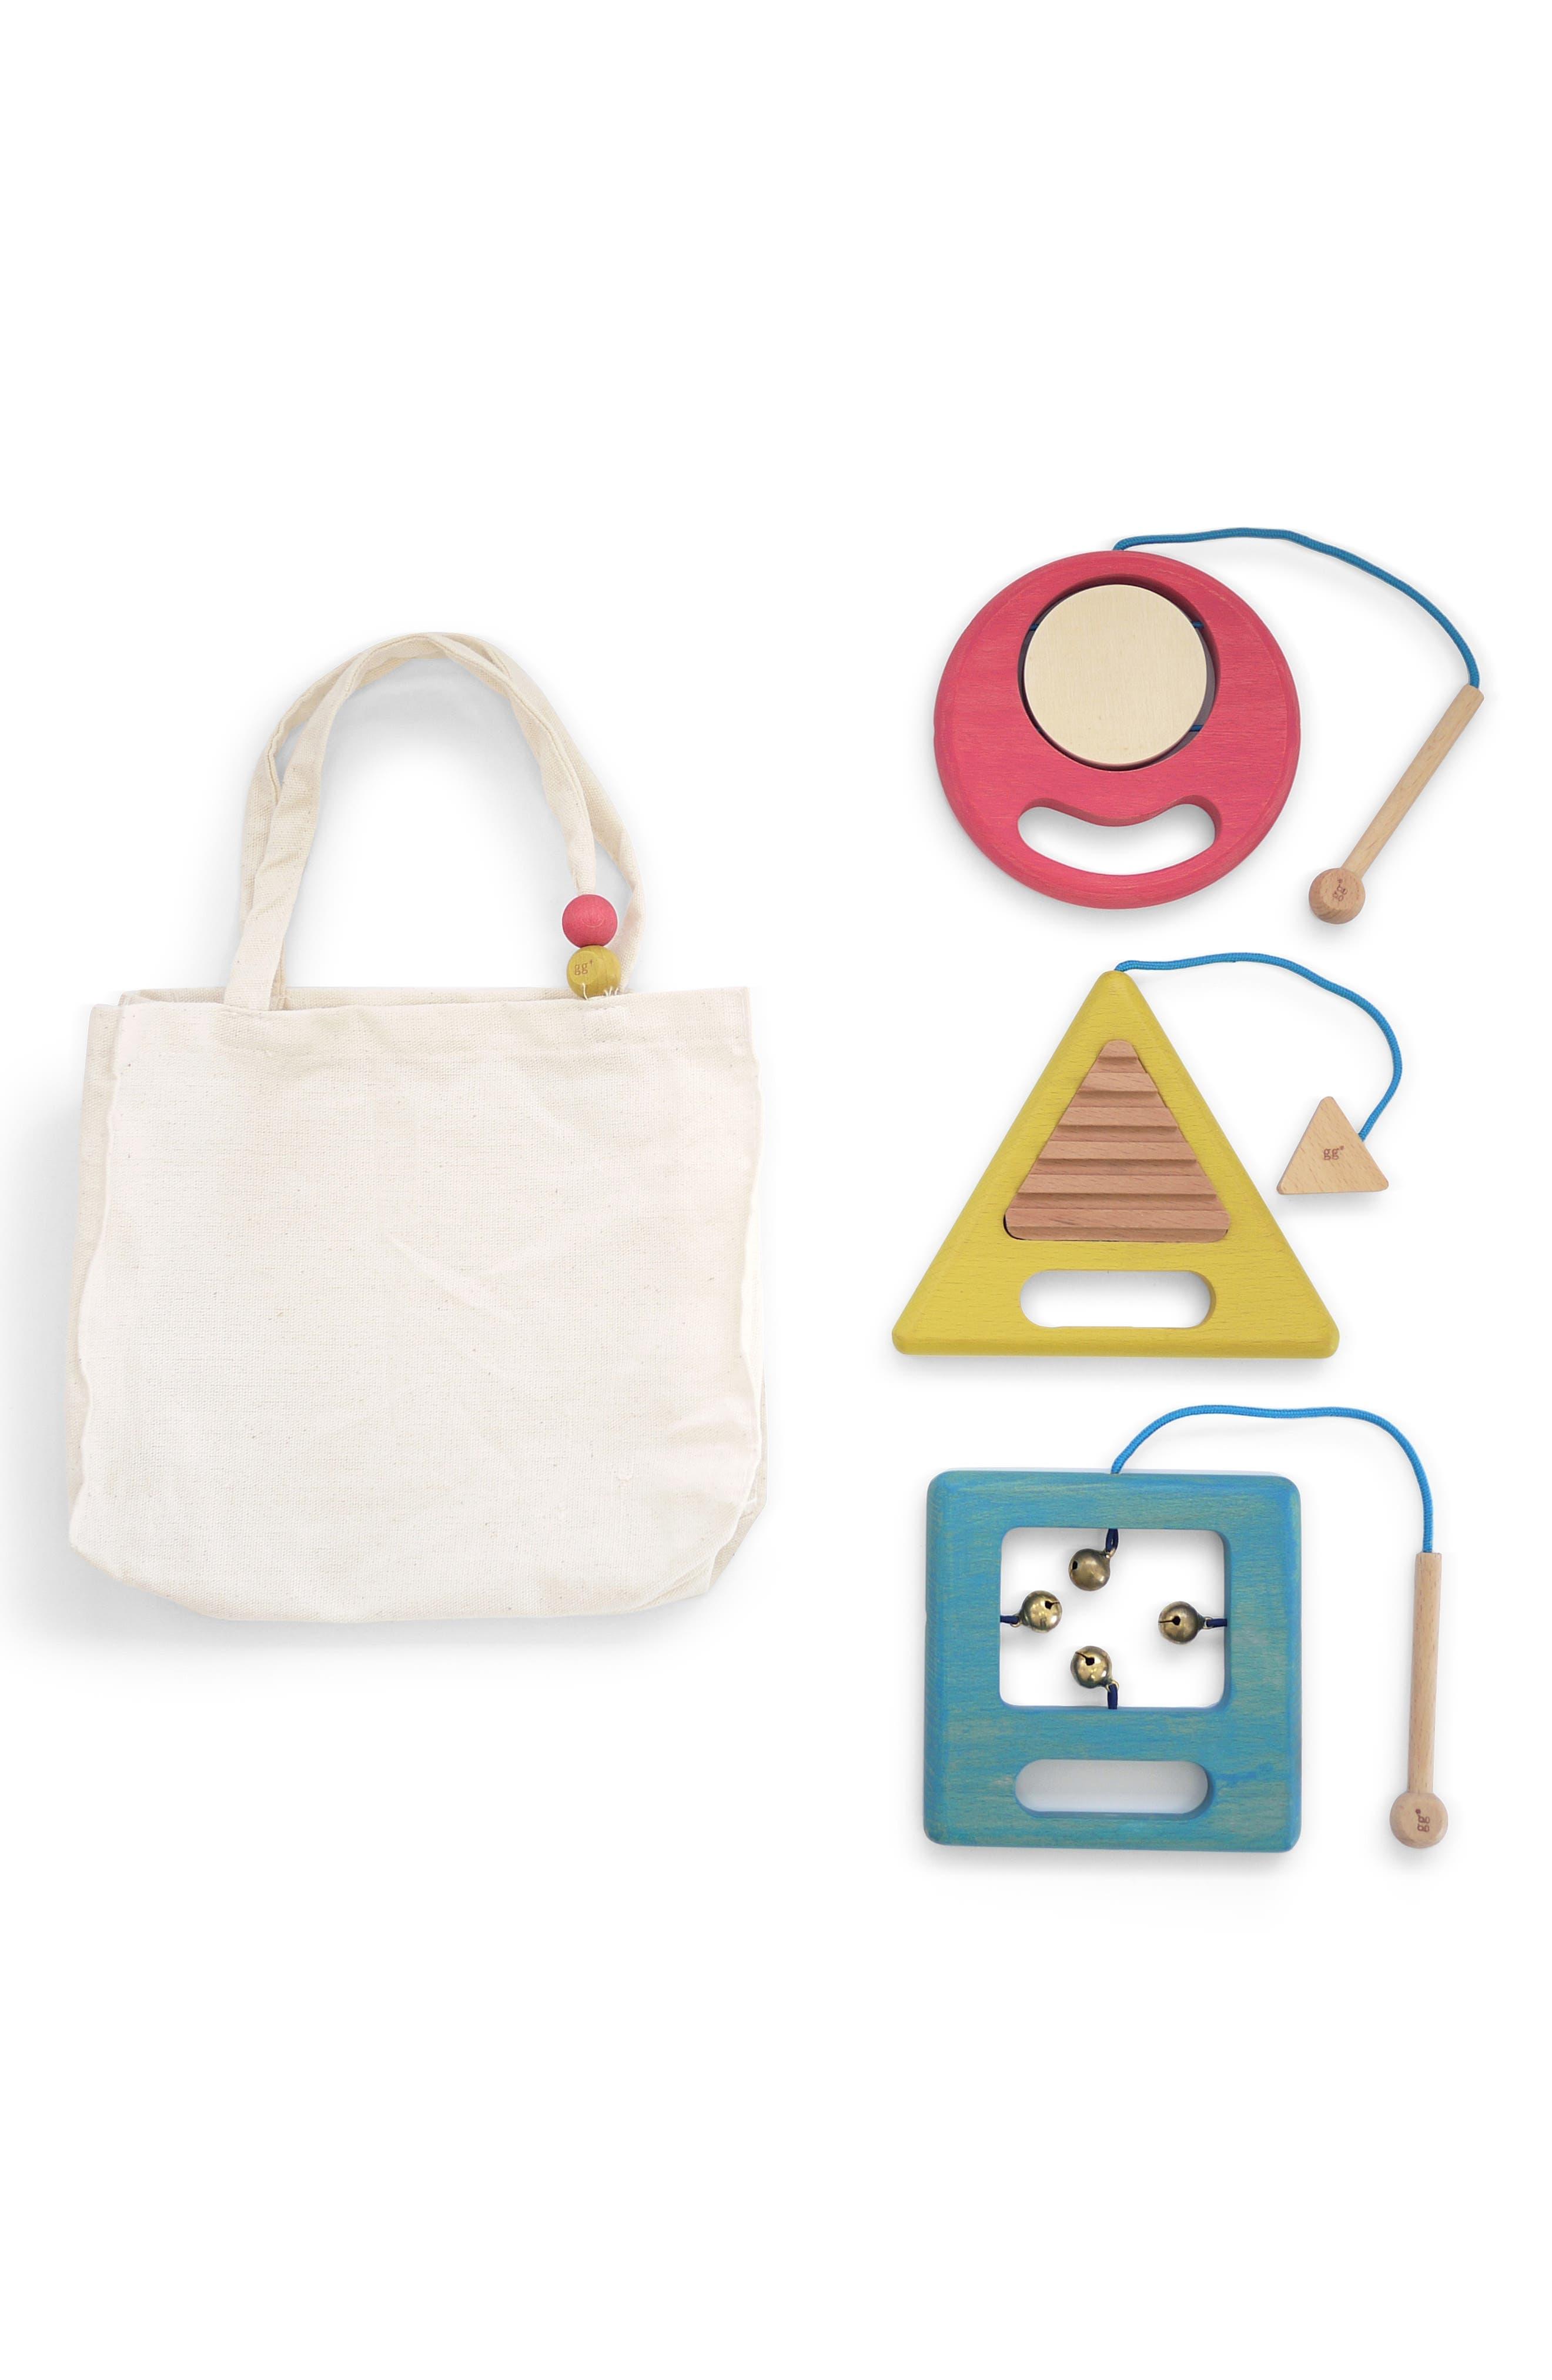 Toddler Kukkia Gakki Set Of 3 Wooden Instruments